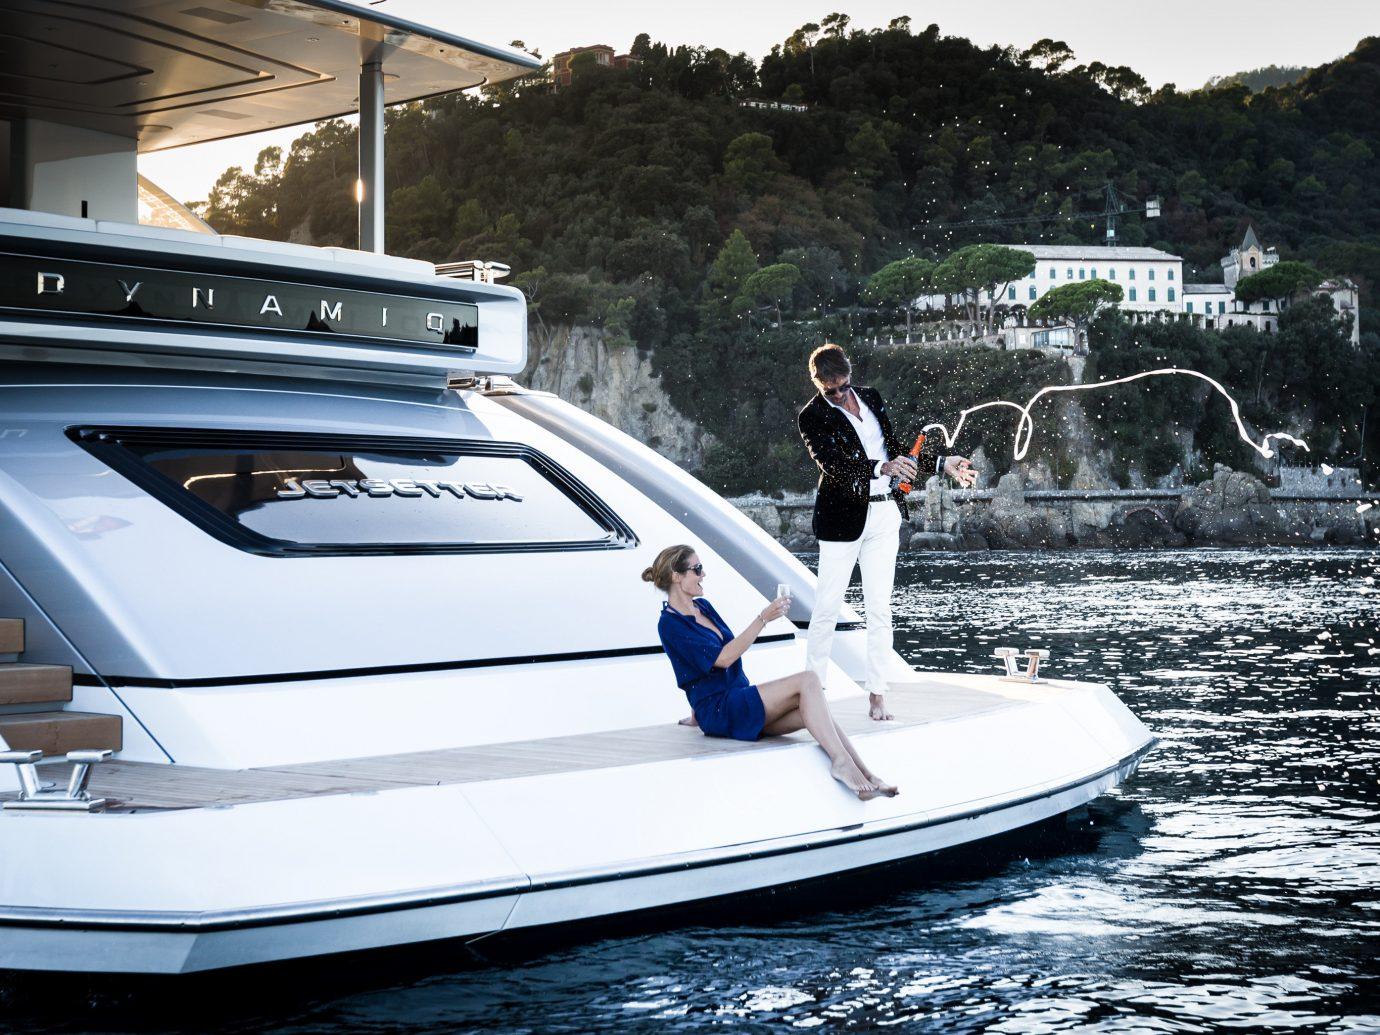 Luxury Travel Trip Ideas outdoor vehicle Boat ecosystem passenger ship motorboat yacht watercraft boating luxury yacht inflatable boat skiff